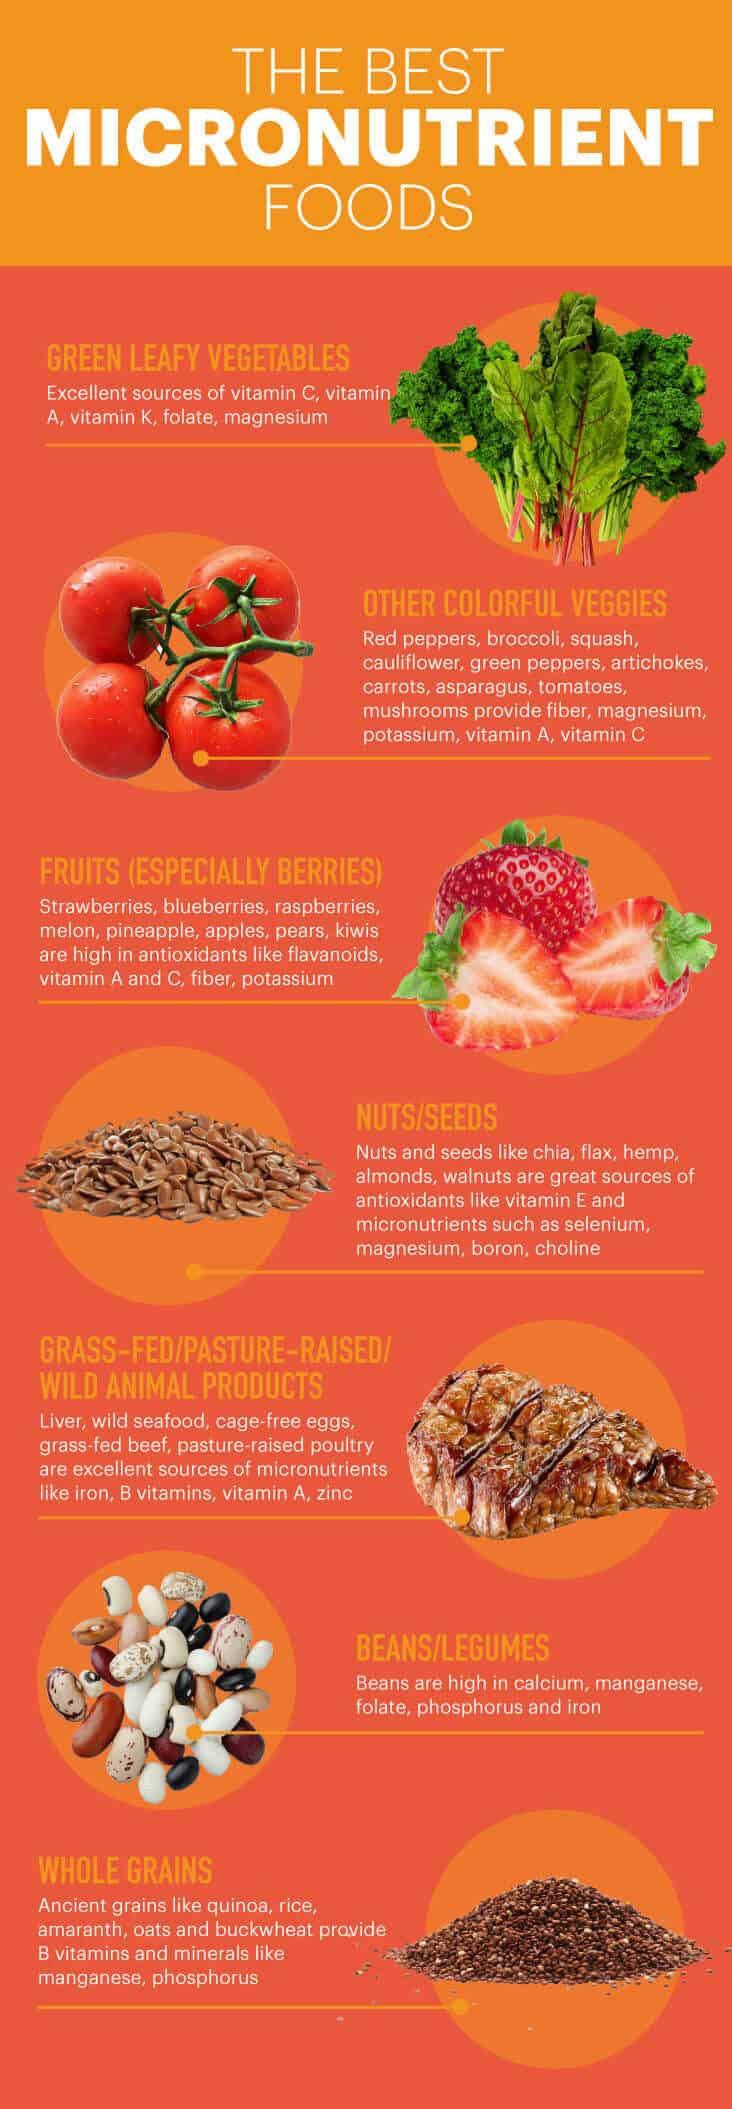 Top micronutrient foods